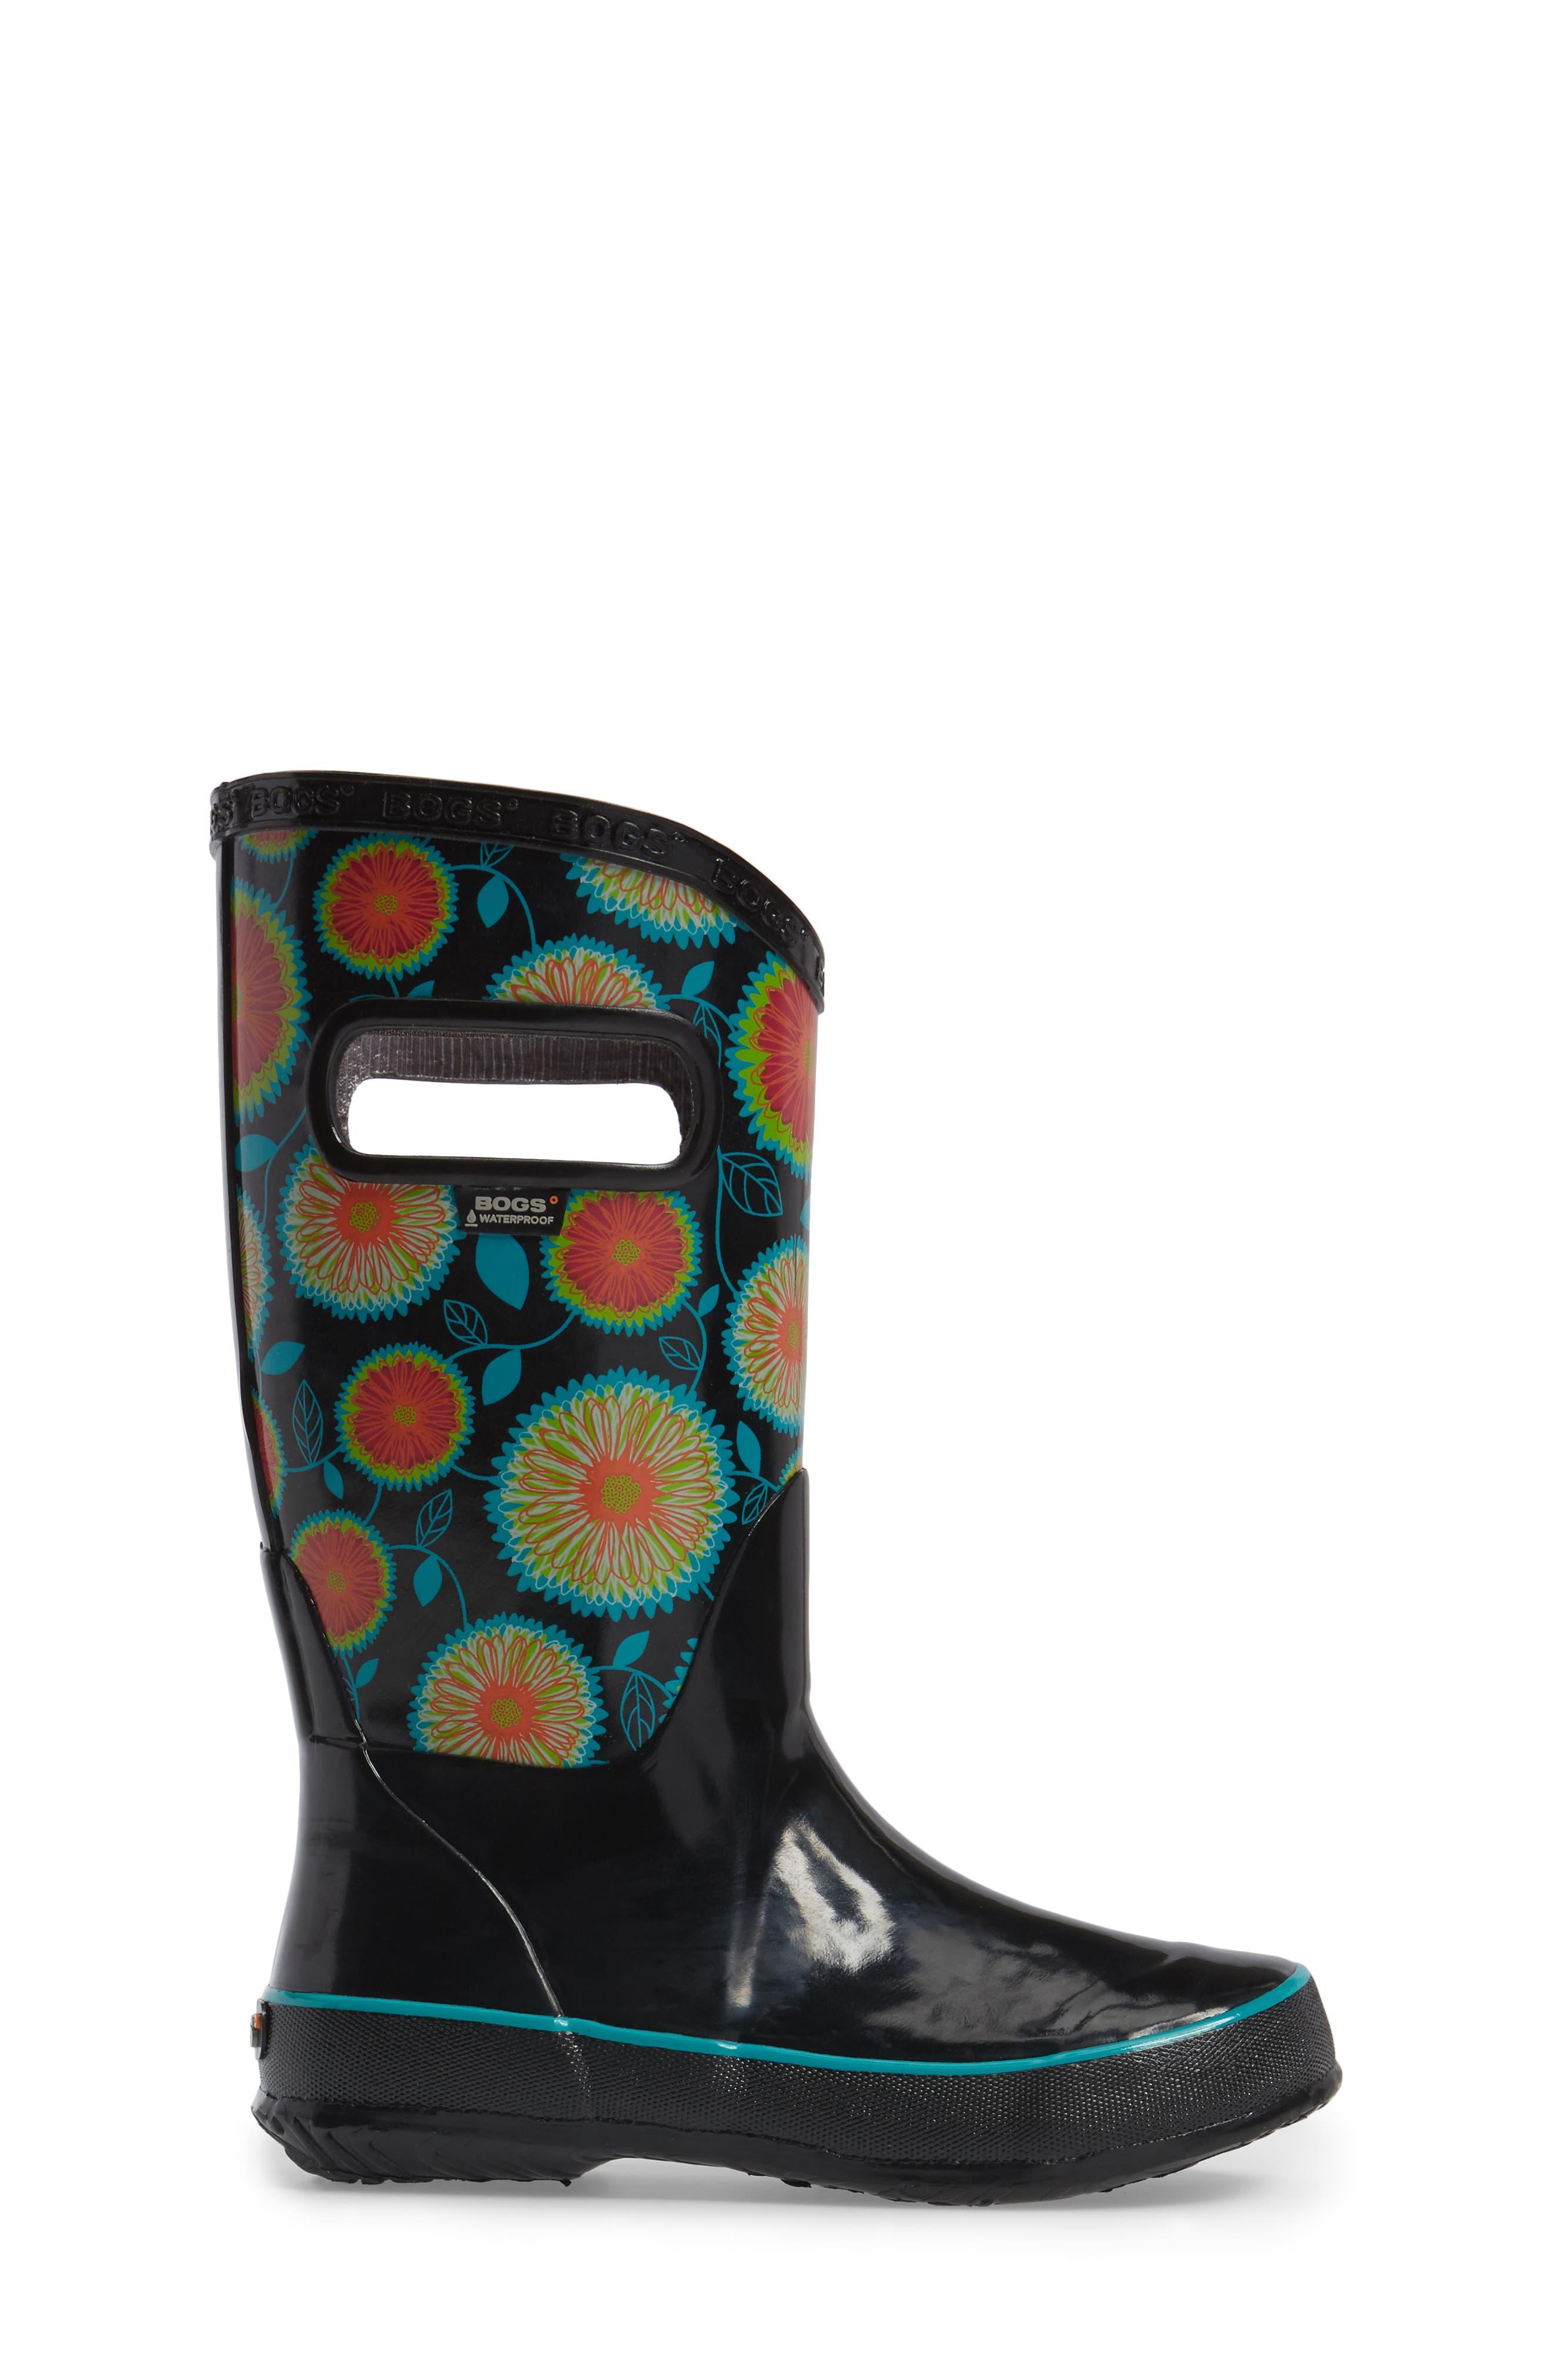 Wildflowers Waterproof Rubber Rain Boot,                             Alternate thumbnail 3, color,                             Black Multi